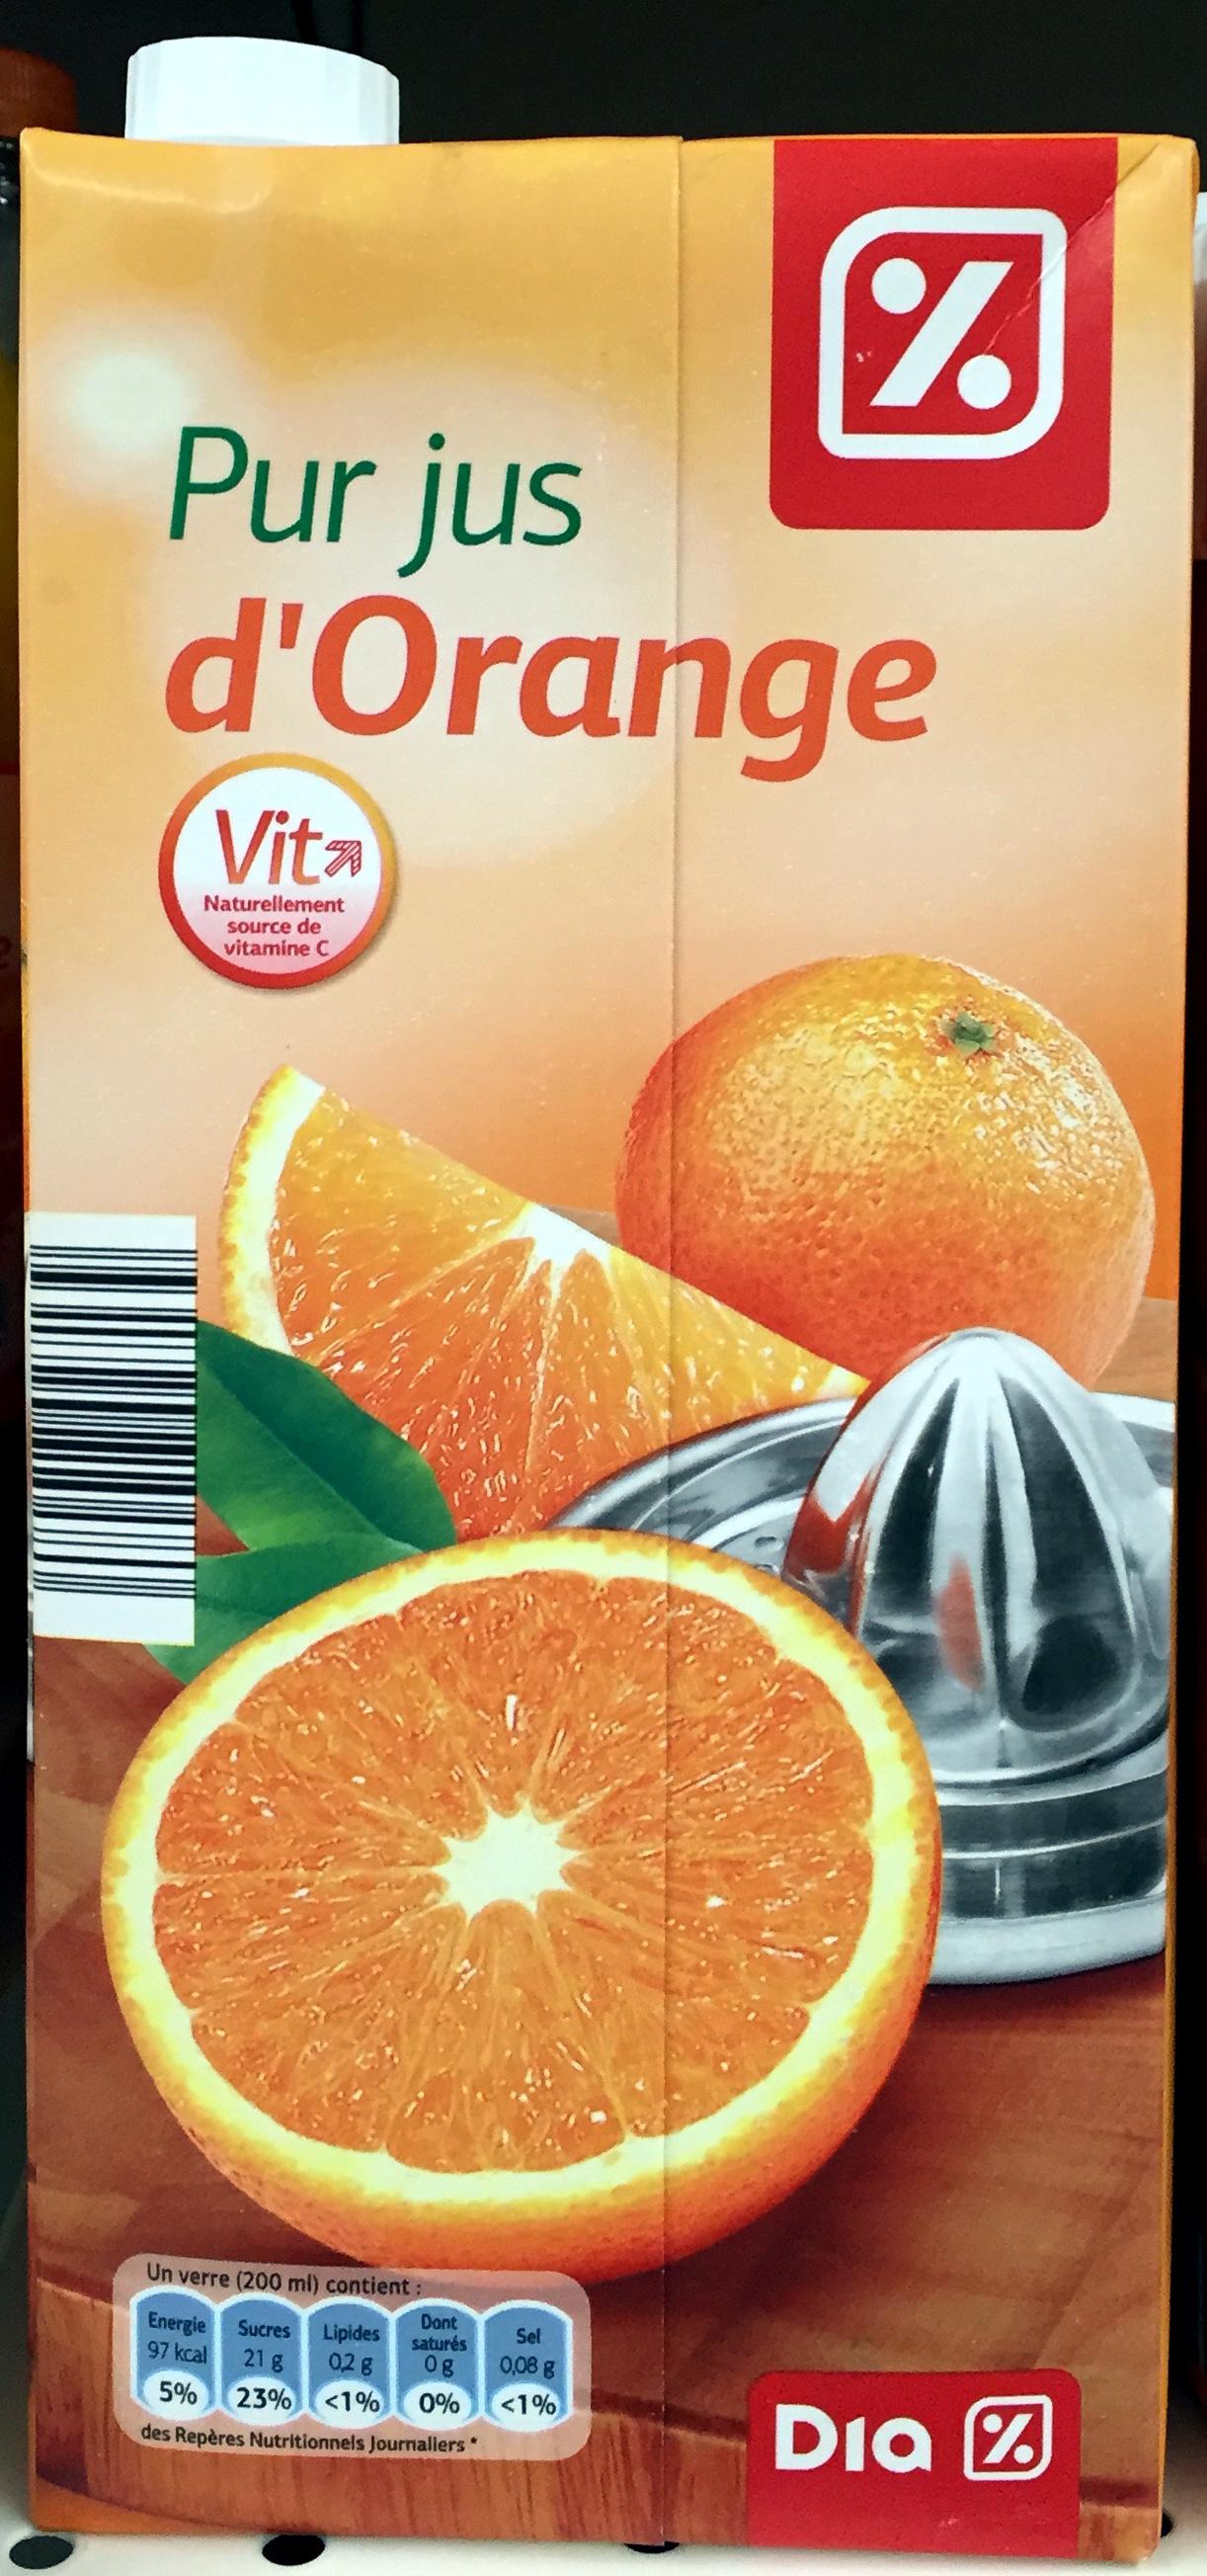 Pur jus d'orange - Product - fr